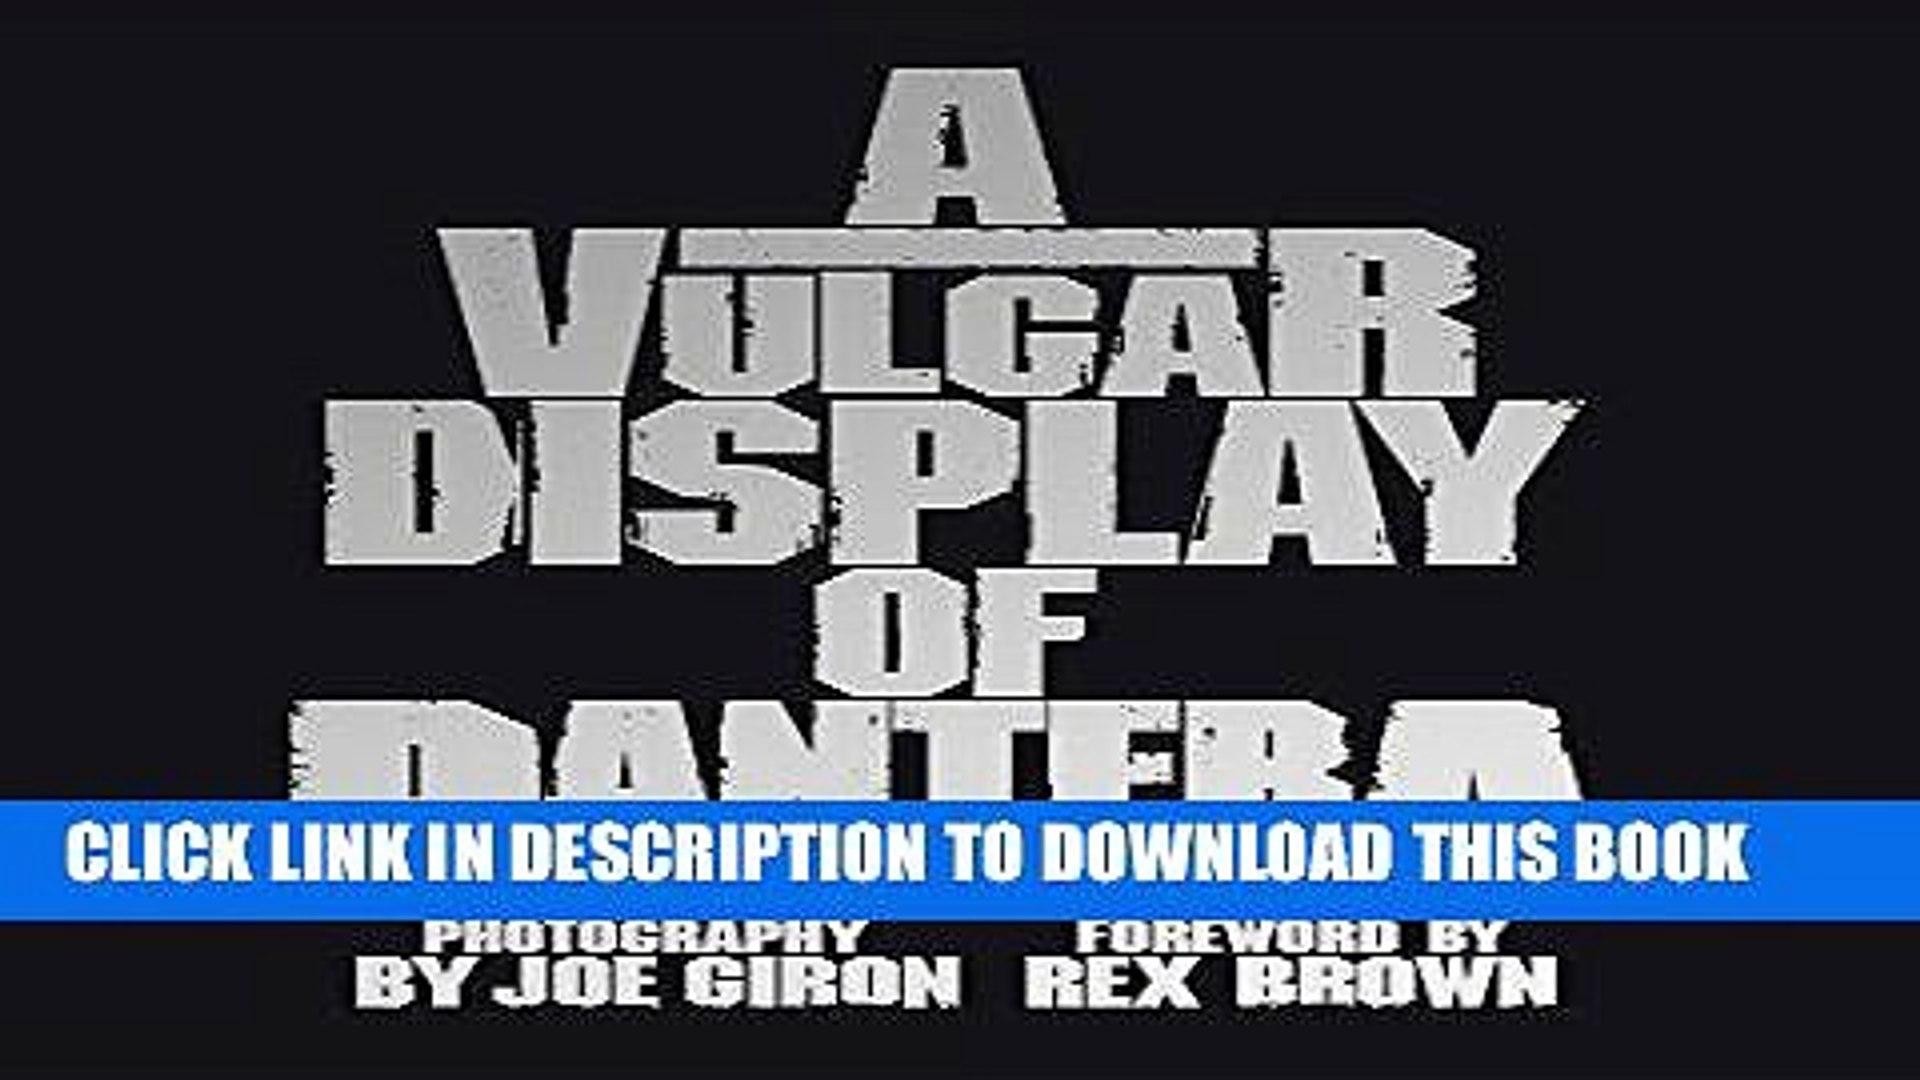 VULGAR BAIXAR CD POWER PANTERA DISPLAY